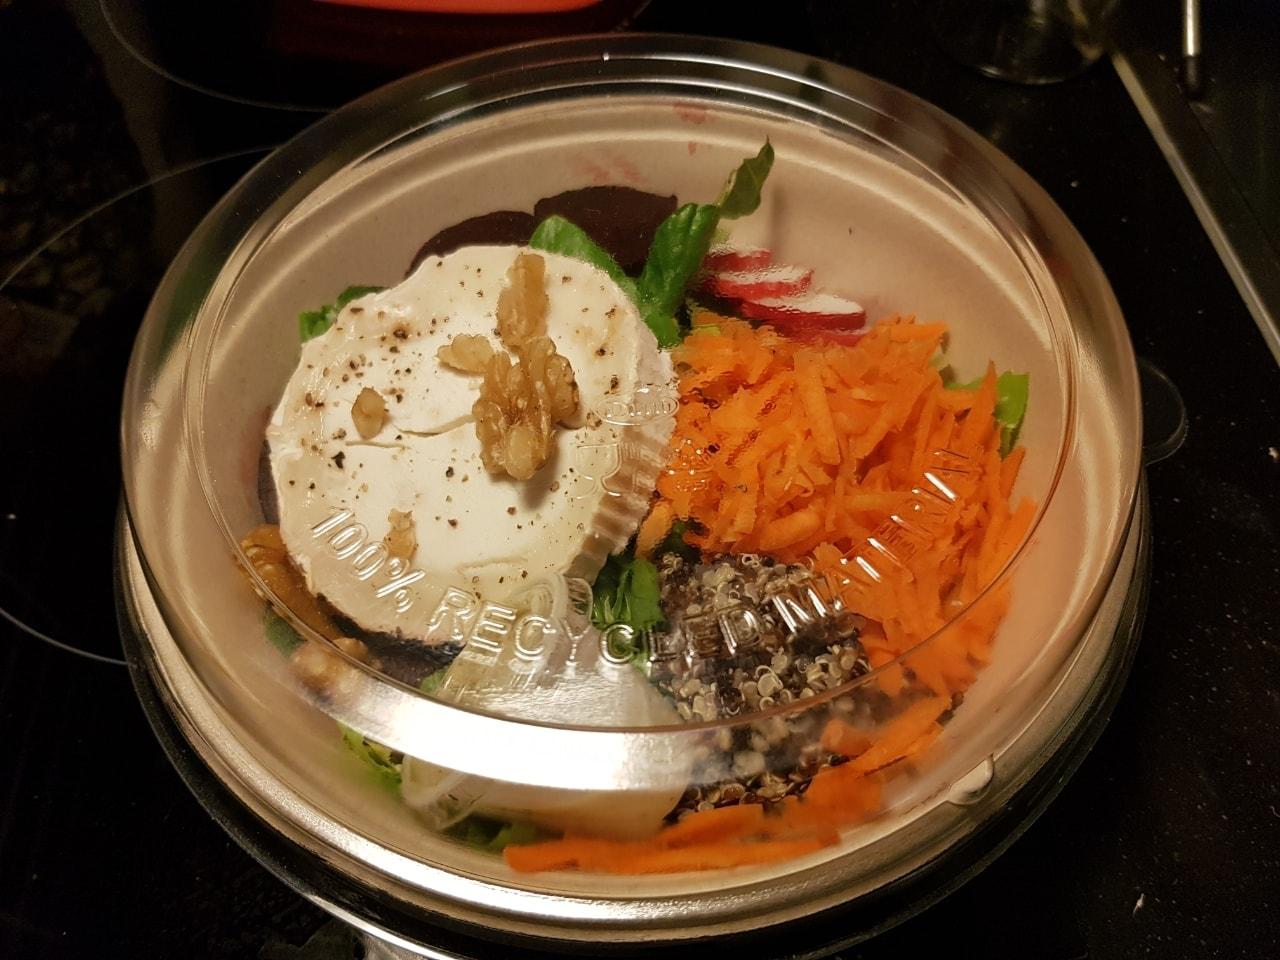 Vegetarian salad from Caffe Nero